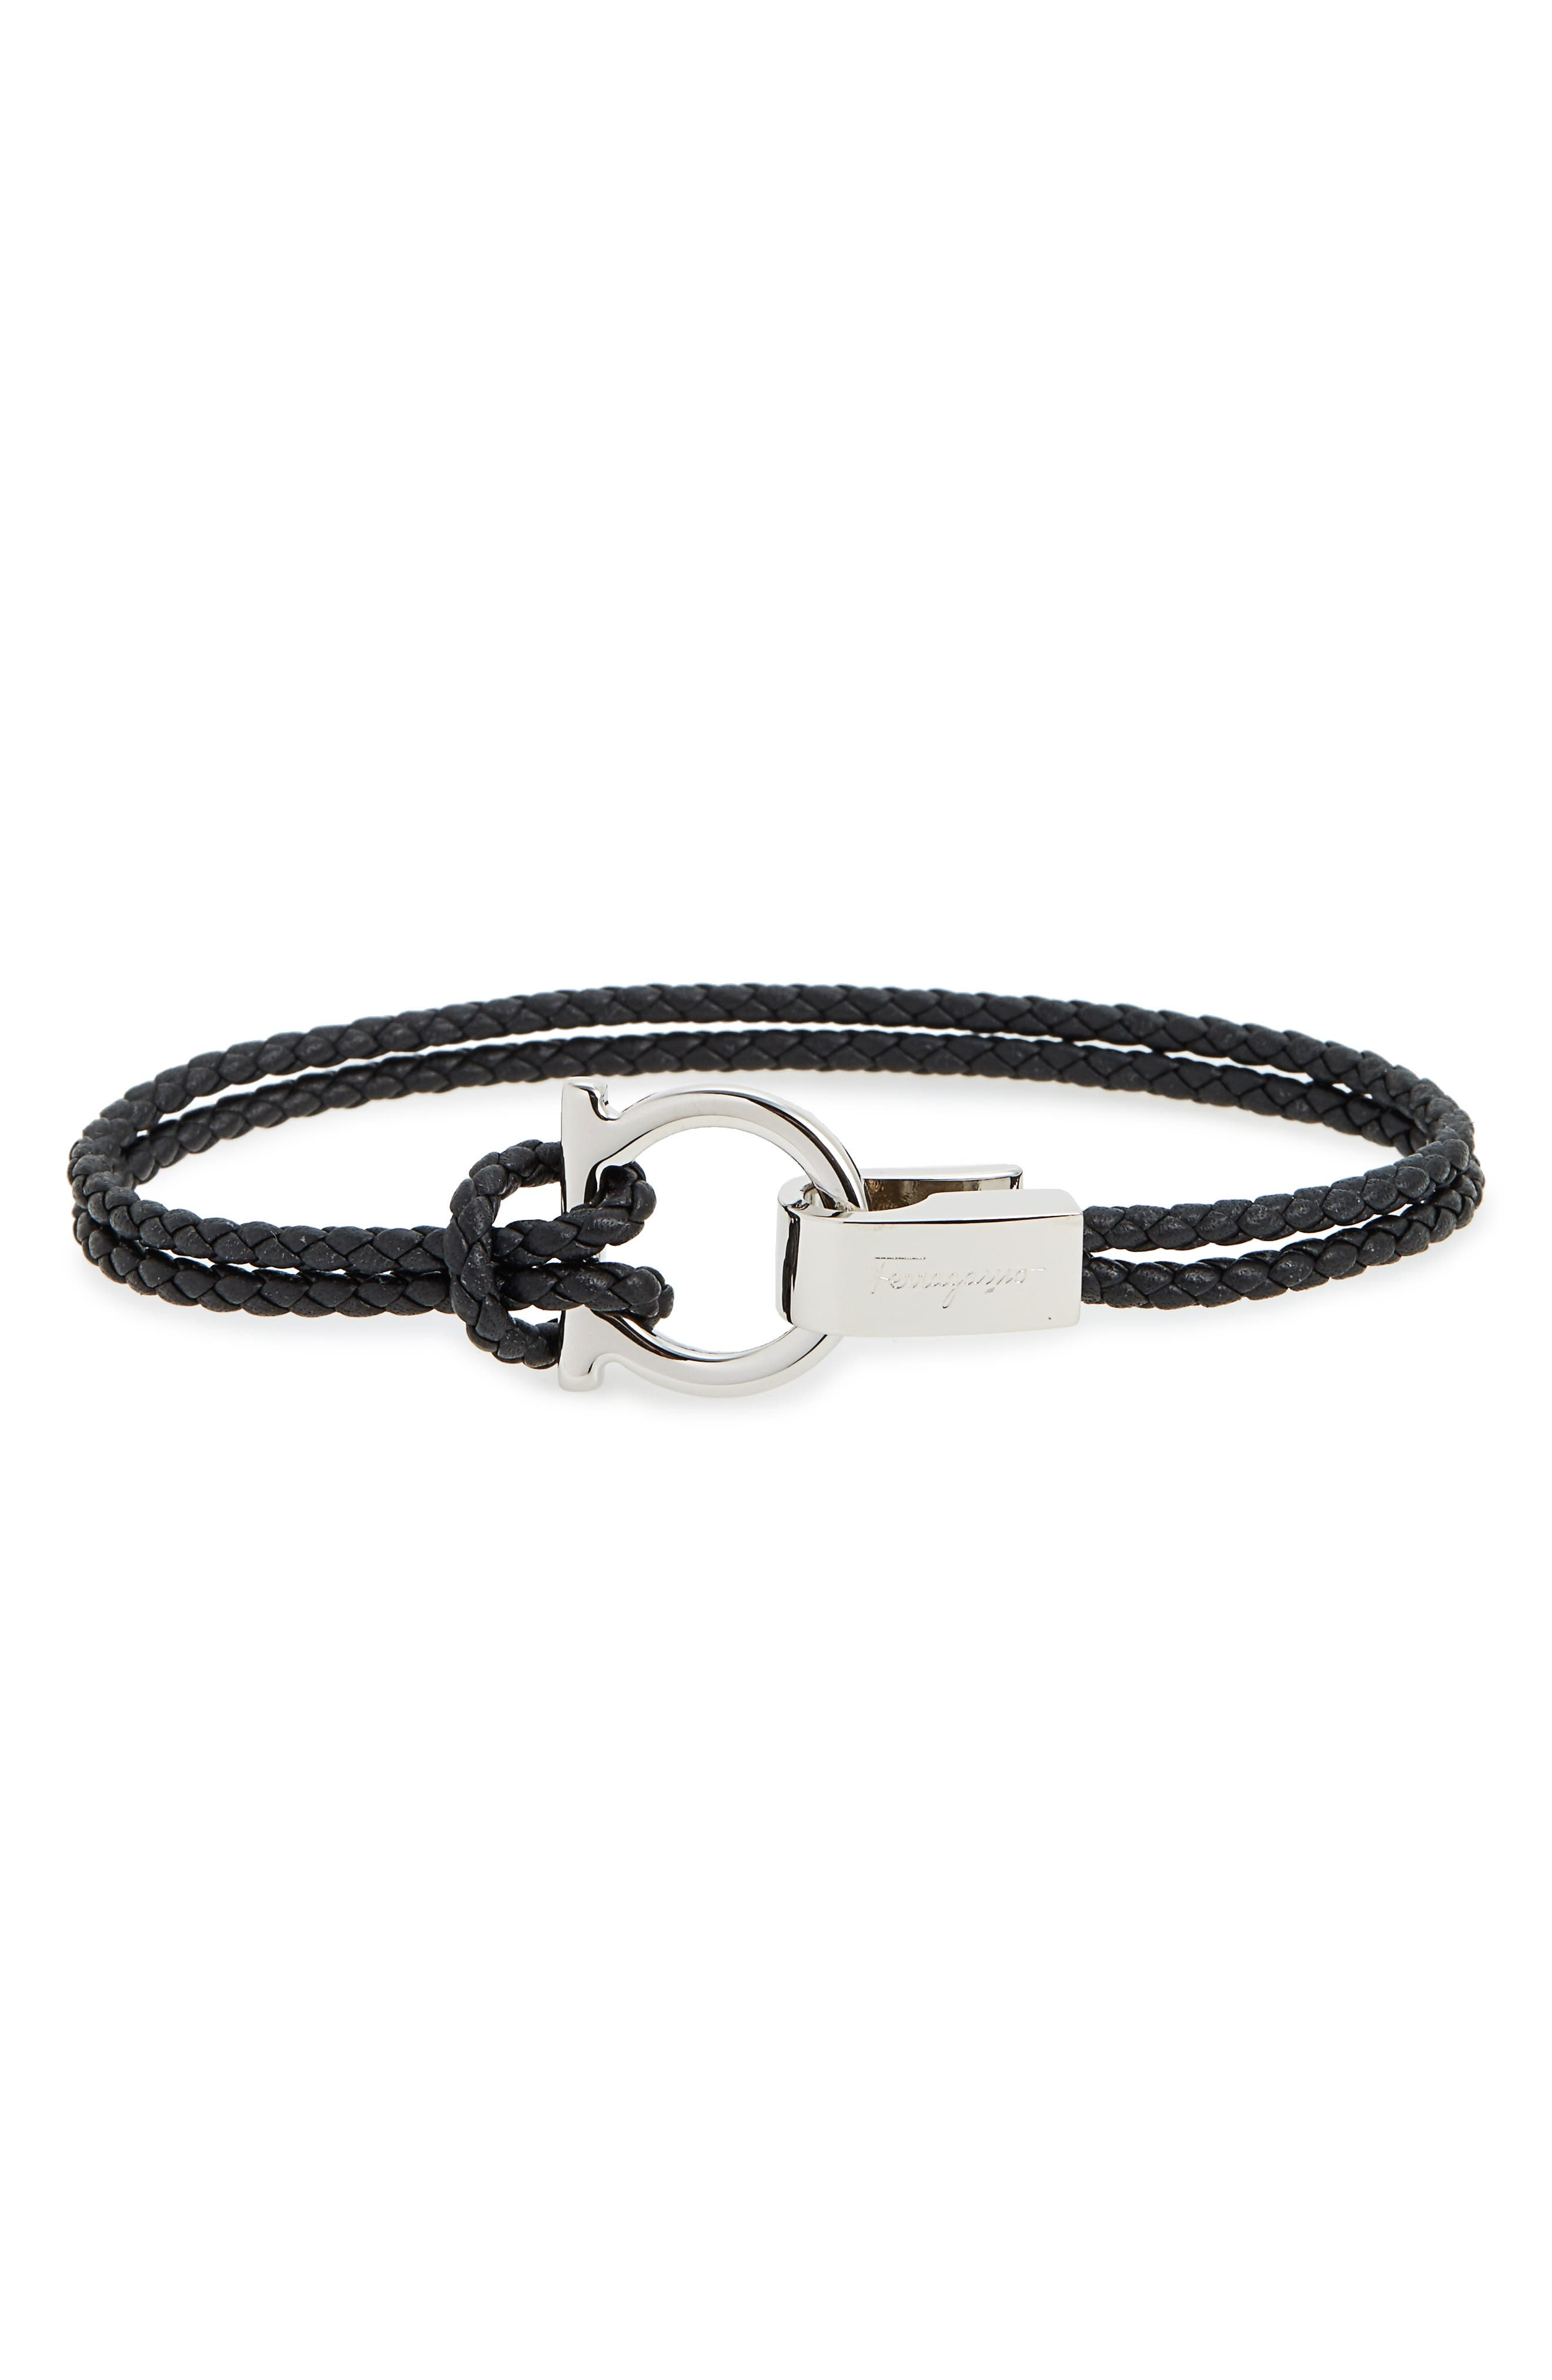 Salvatore Ferragamo Double Braided Gancini Leather Bracelet